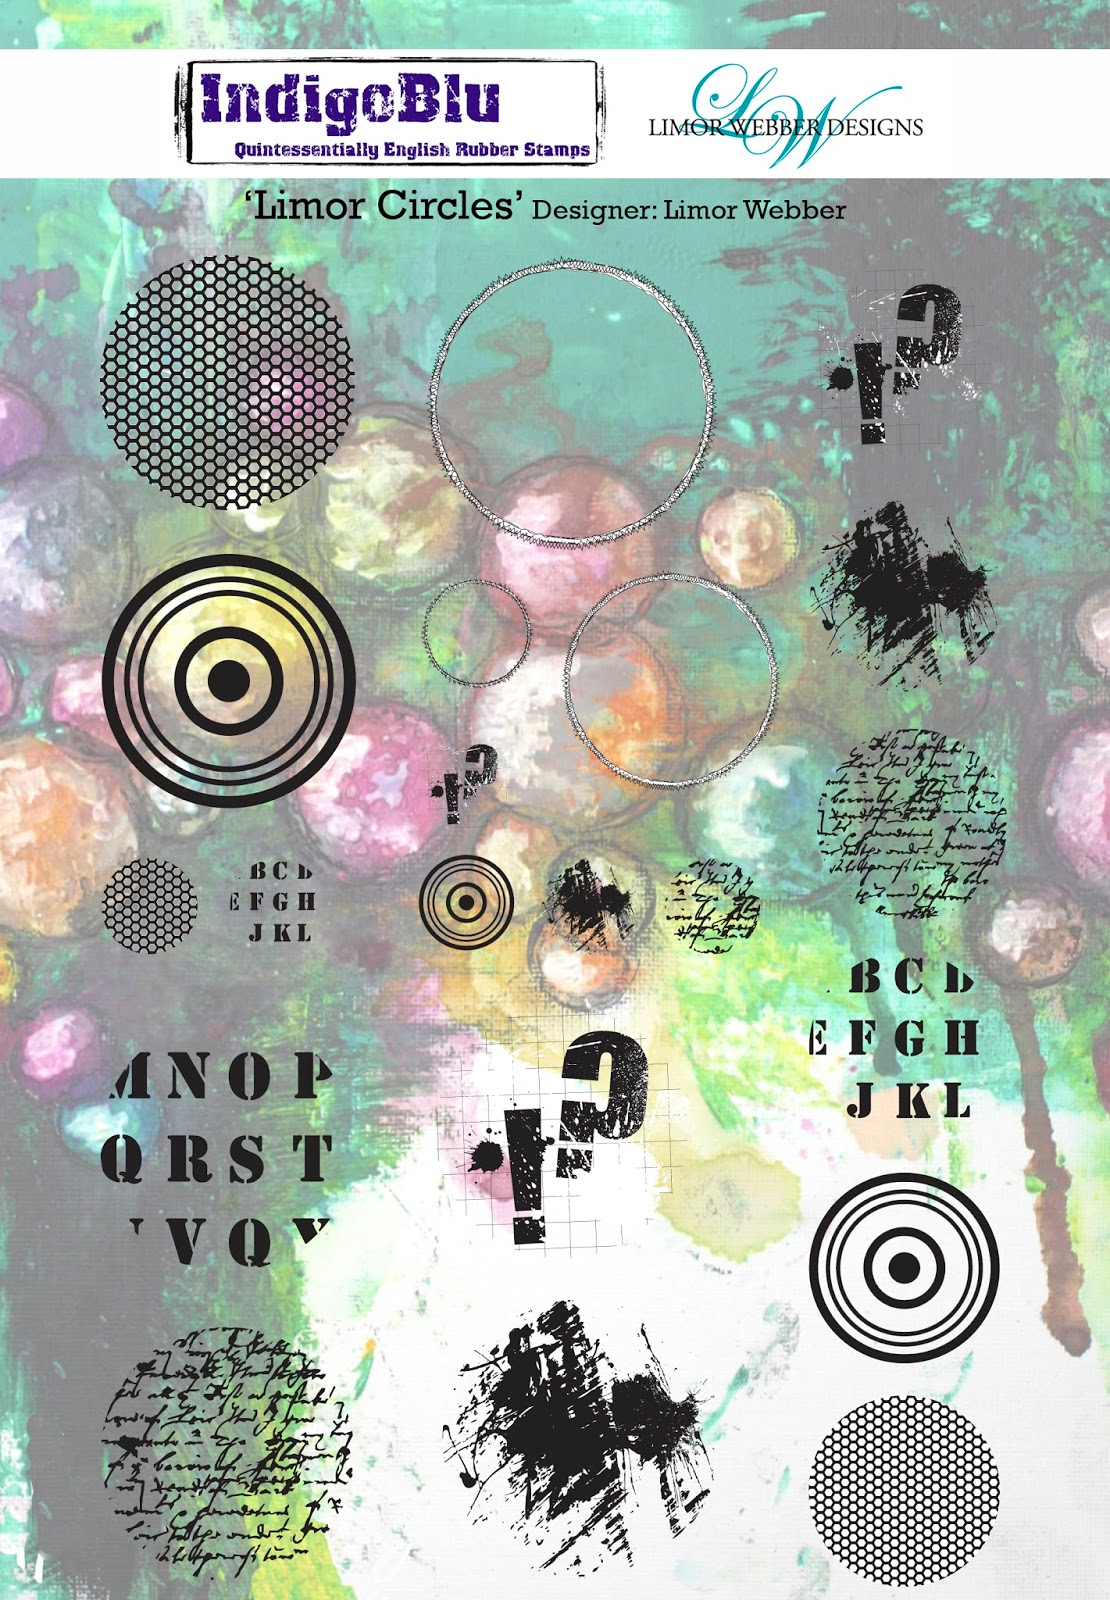 http://www.limorwebber.com/product/limor-circles-limor-webber-designs-stamps-by-indigoblu/